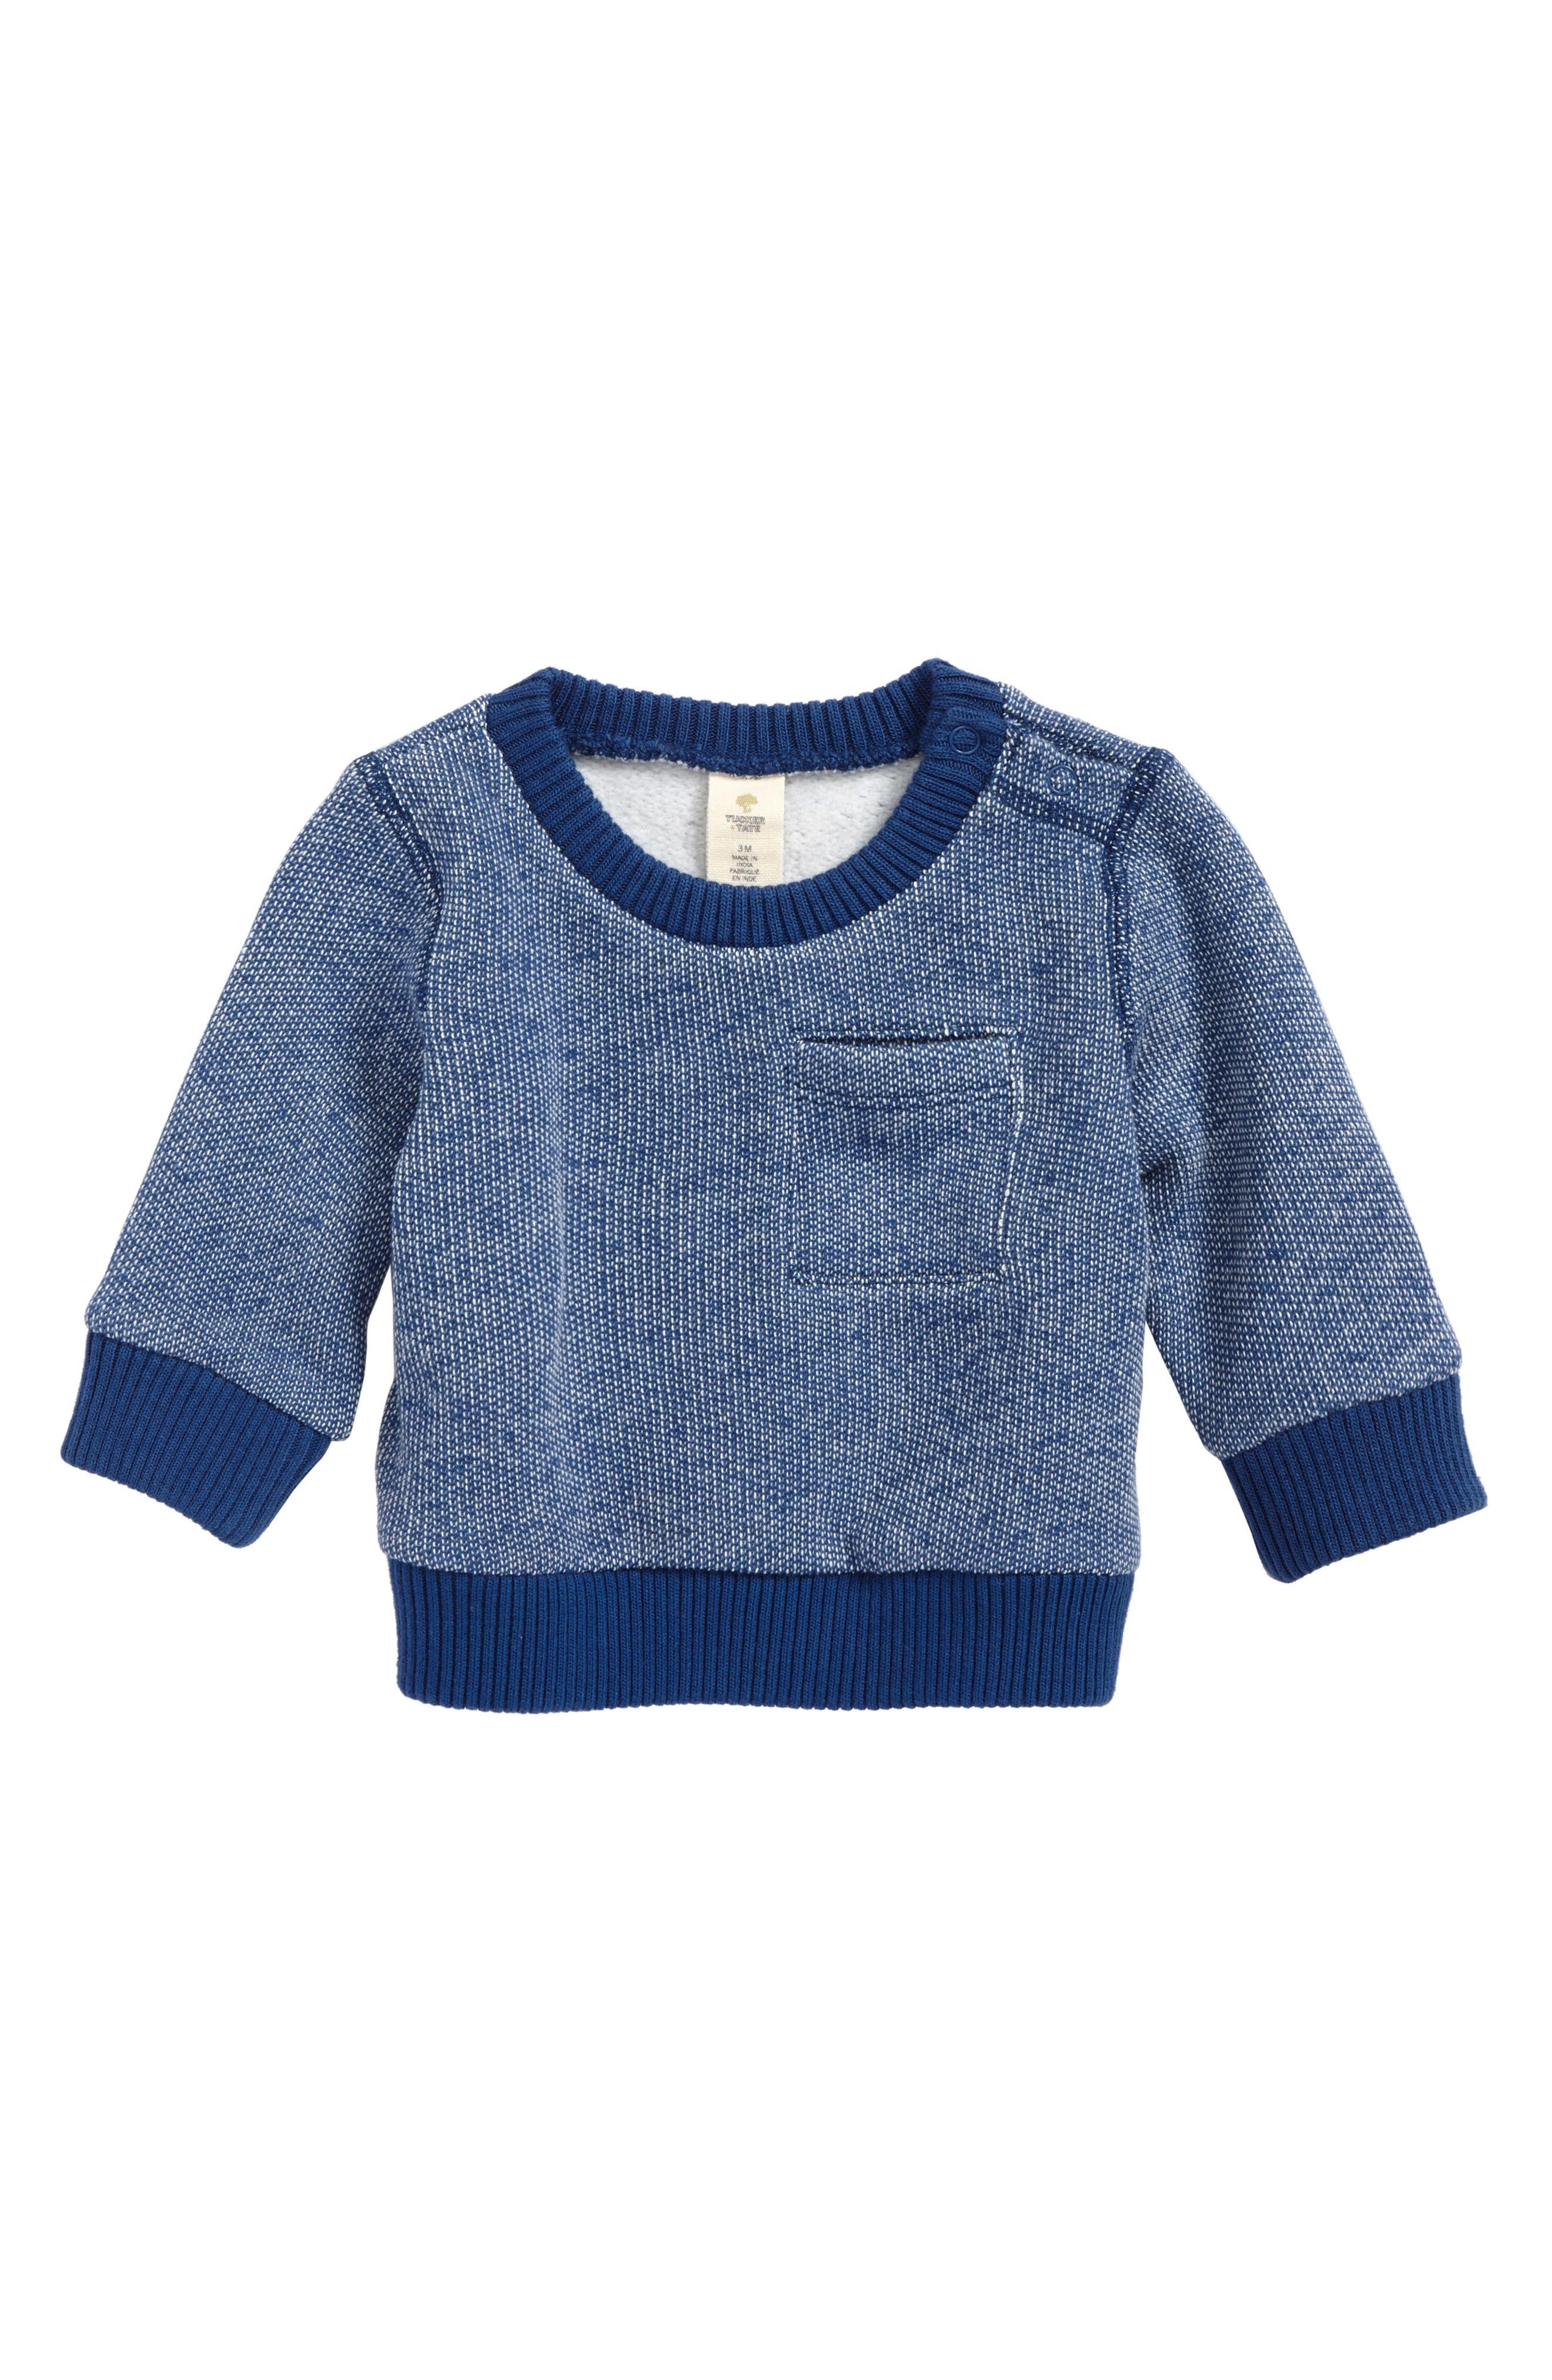 Brushed Fleece Sweatshirt,                         Main,                         color, Blue Cendre